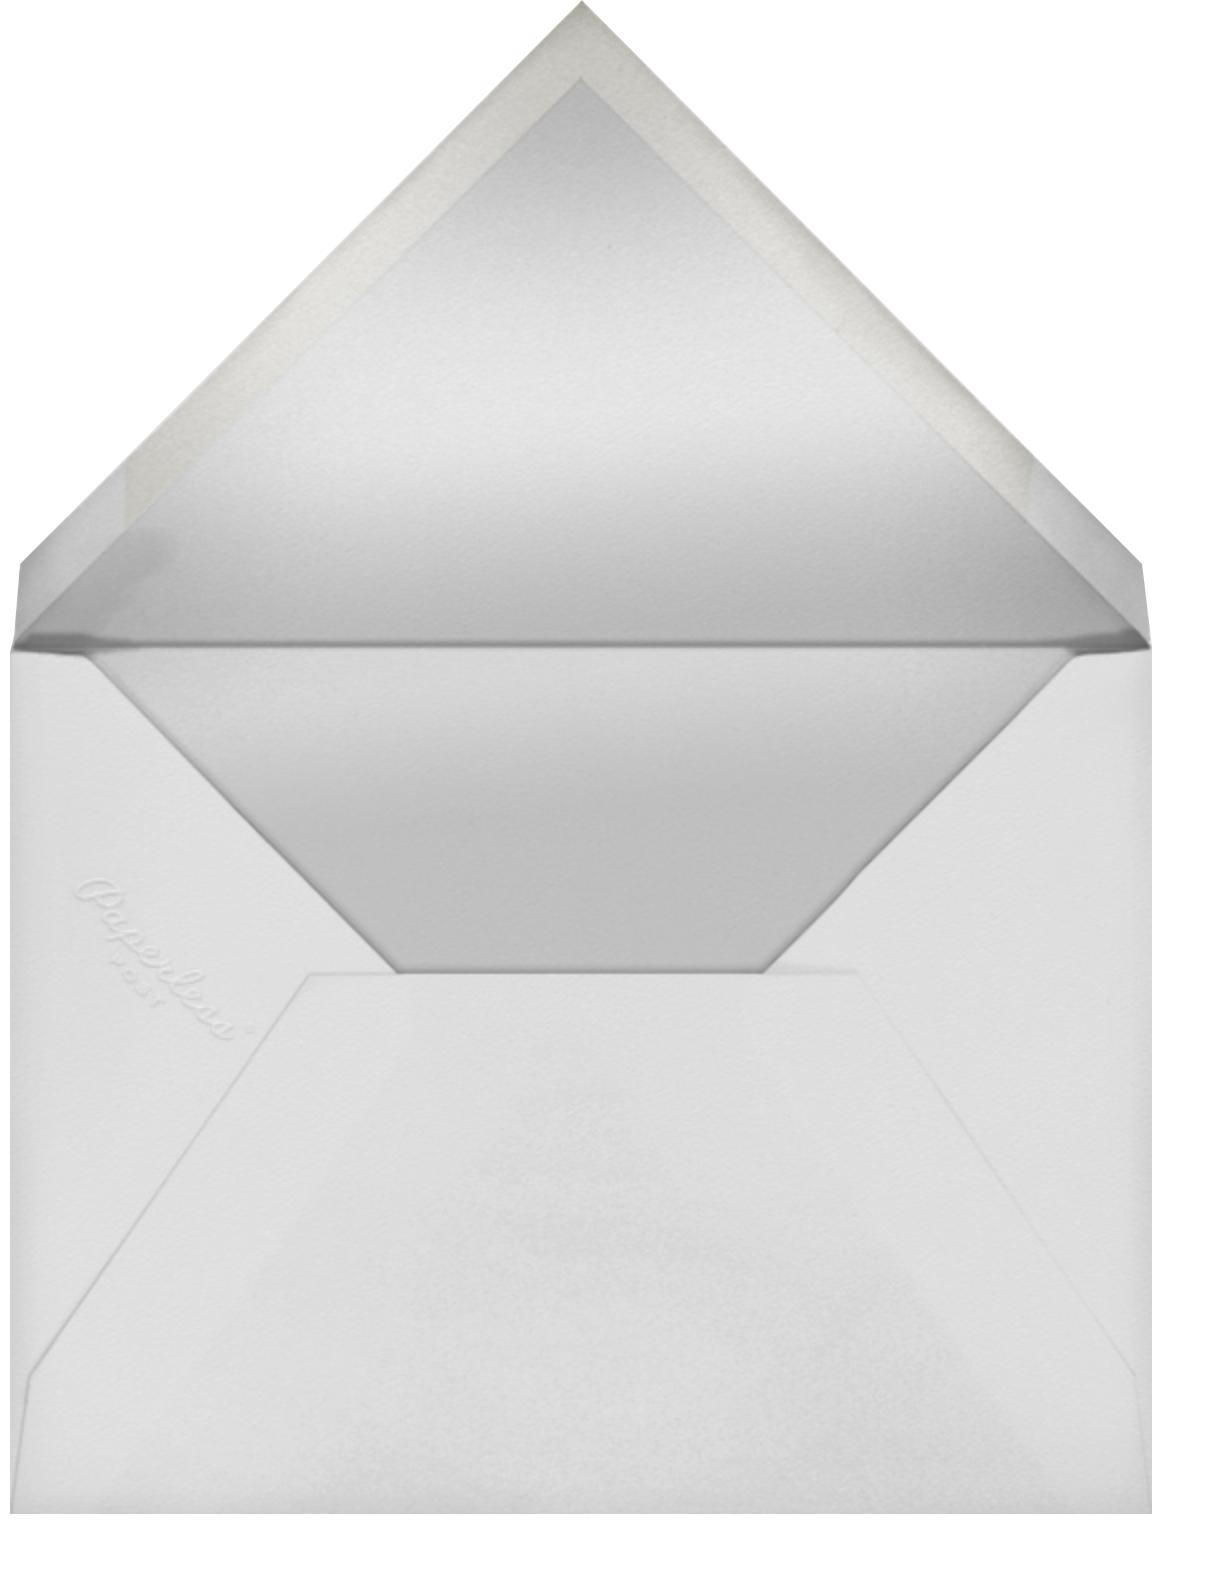 Tartan (Menu) - Carnation - Oscar de la Renta - Oscar de la Renta - envelope back